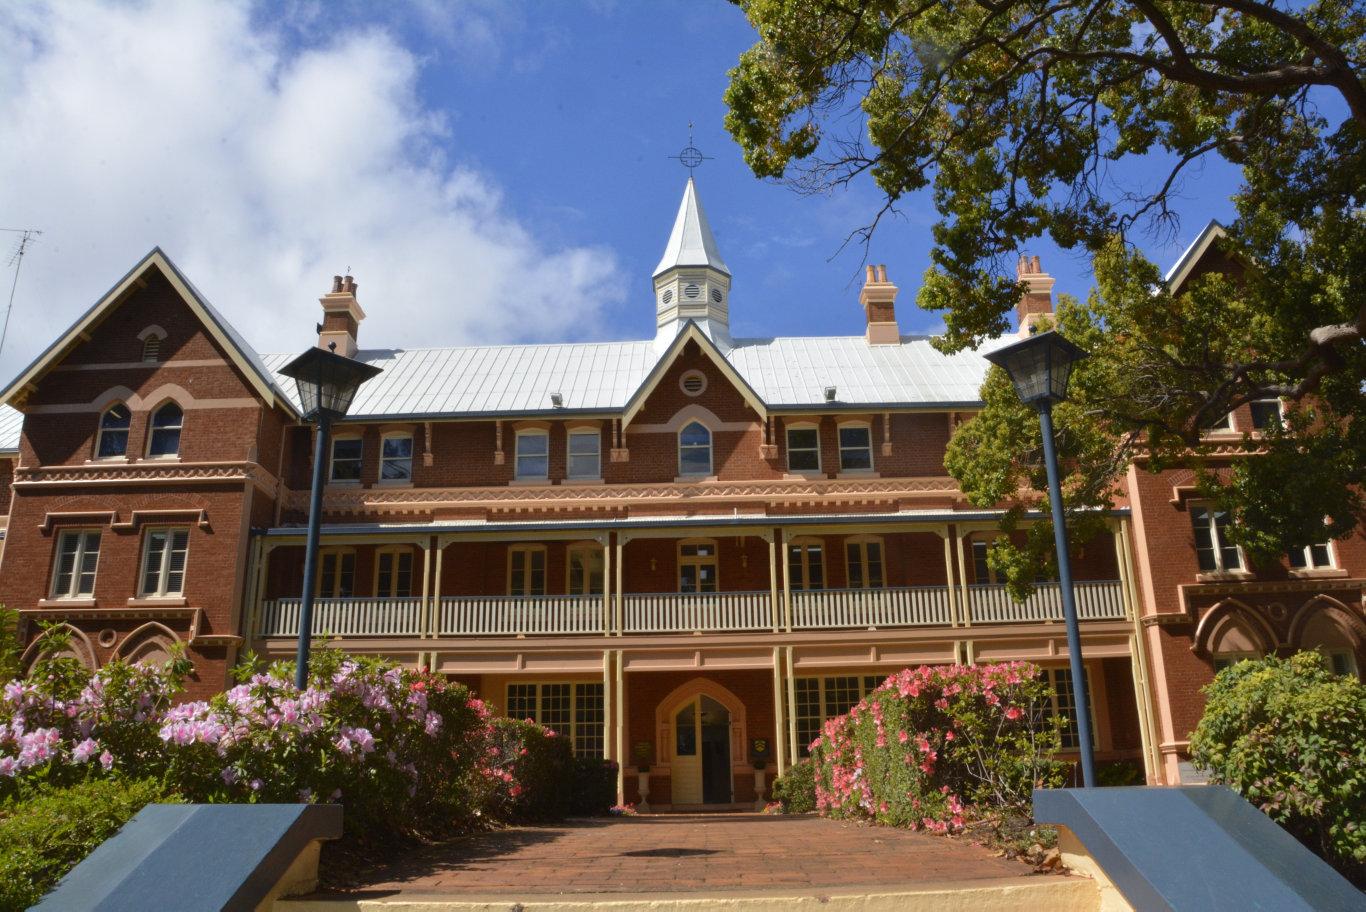 Toowoomba Grammar School generic.